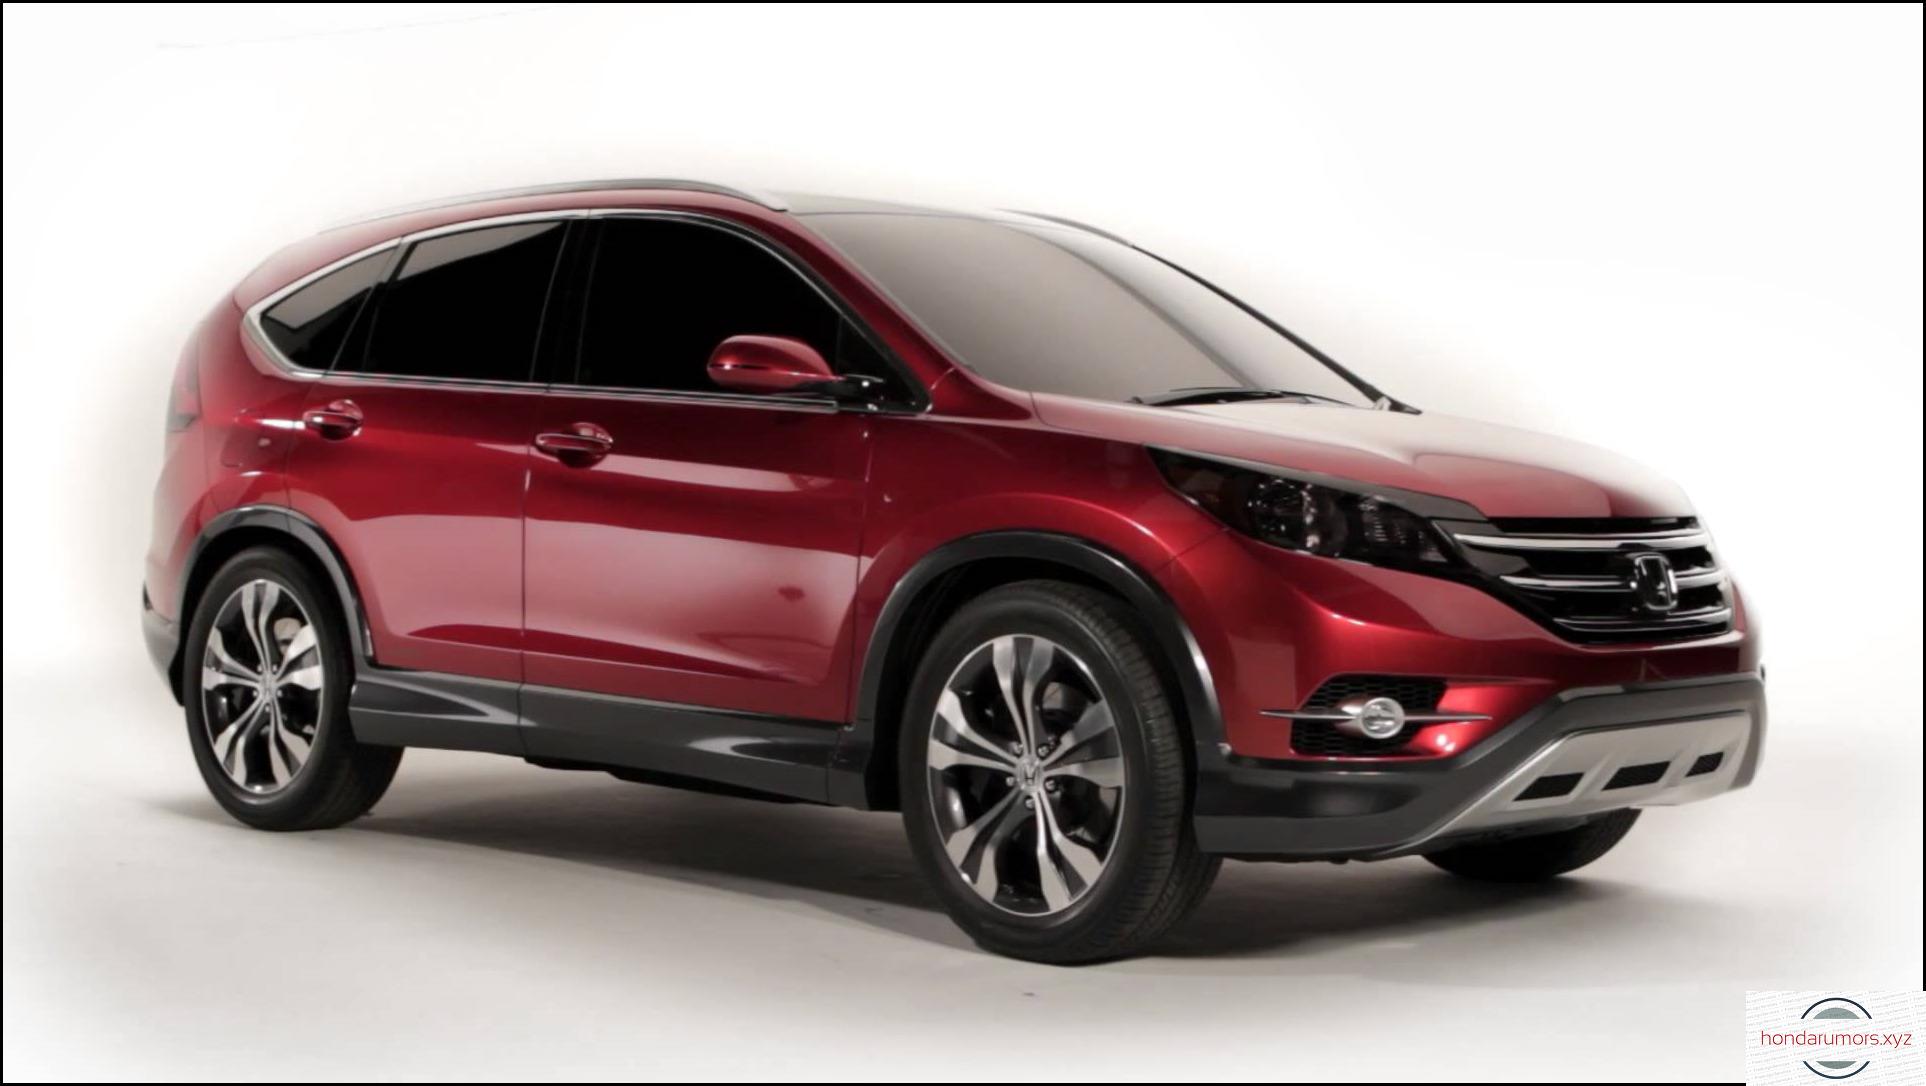 honda crv hrv release hybrid redesign date changes hr colors menu cars latest accord drivetrain process